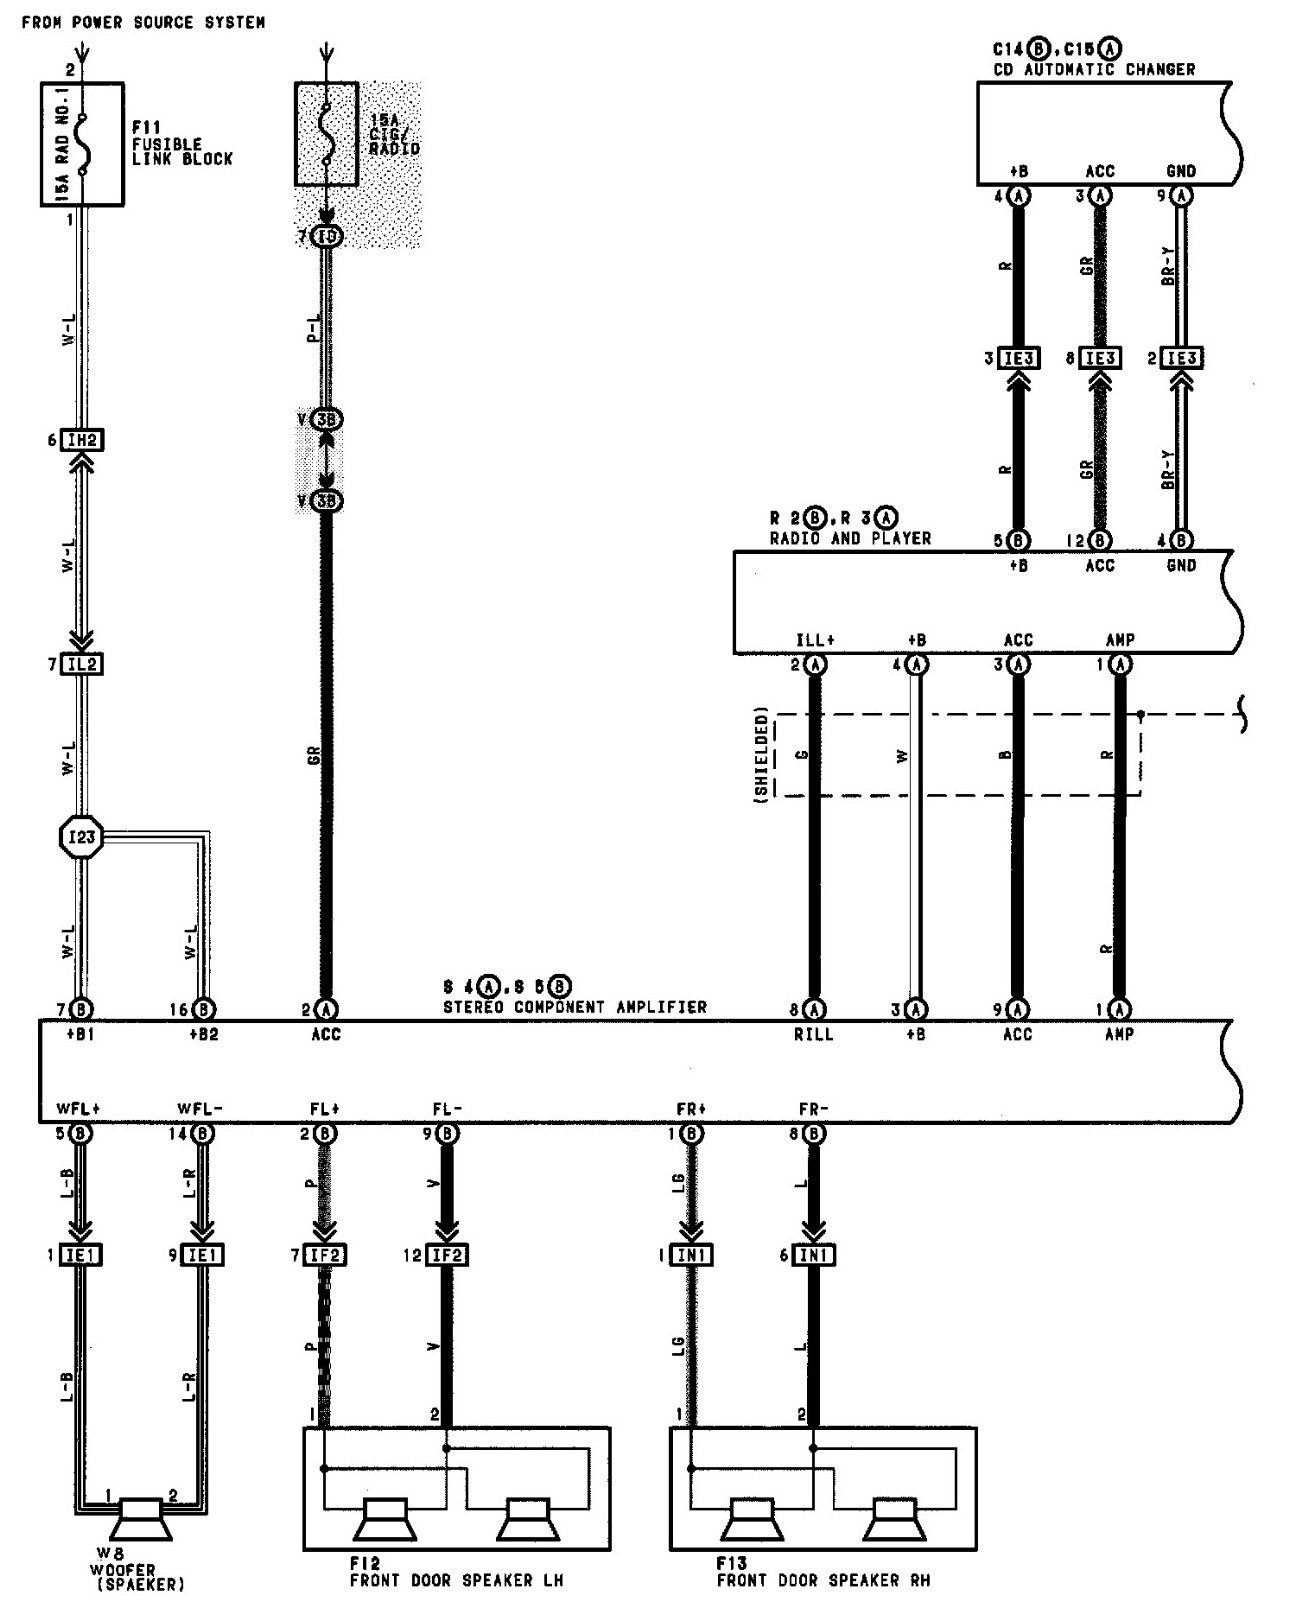 Bose Car Stereo Wiring Diagrams